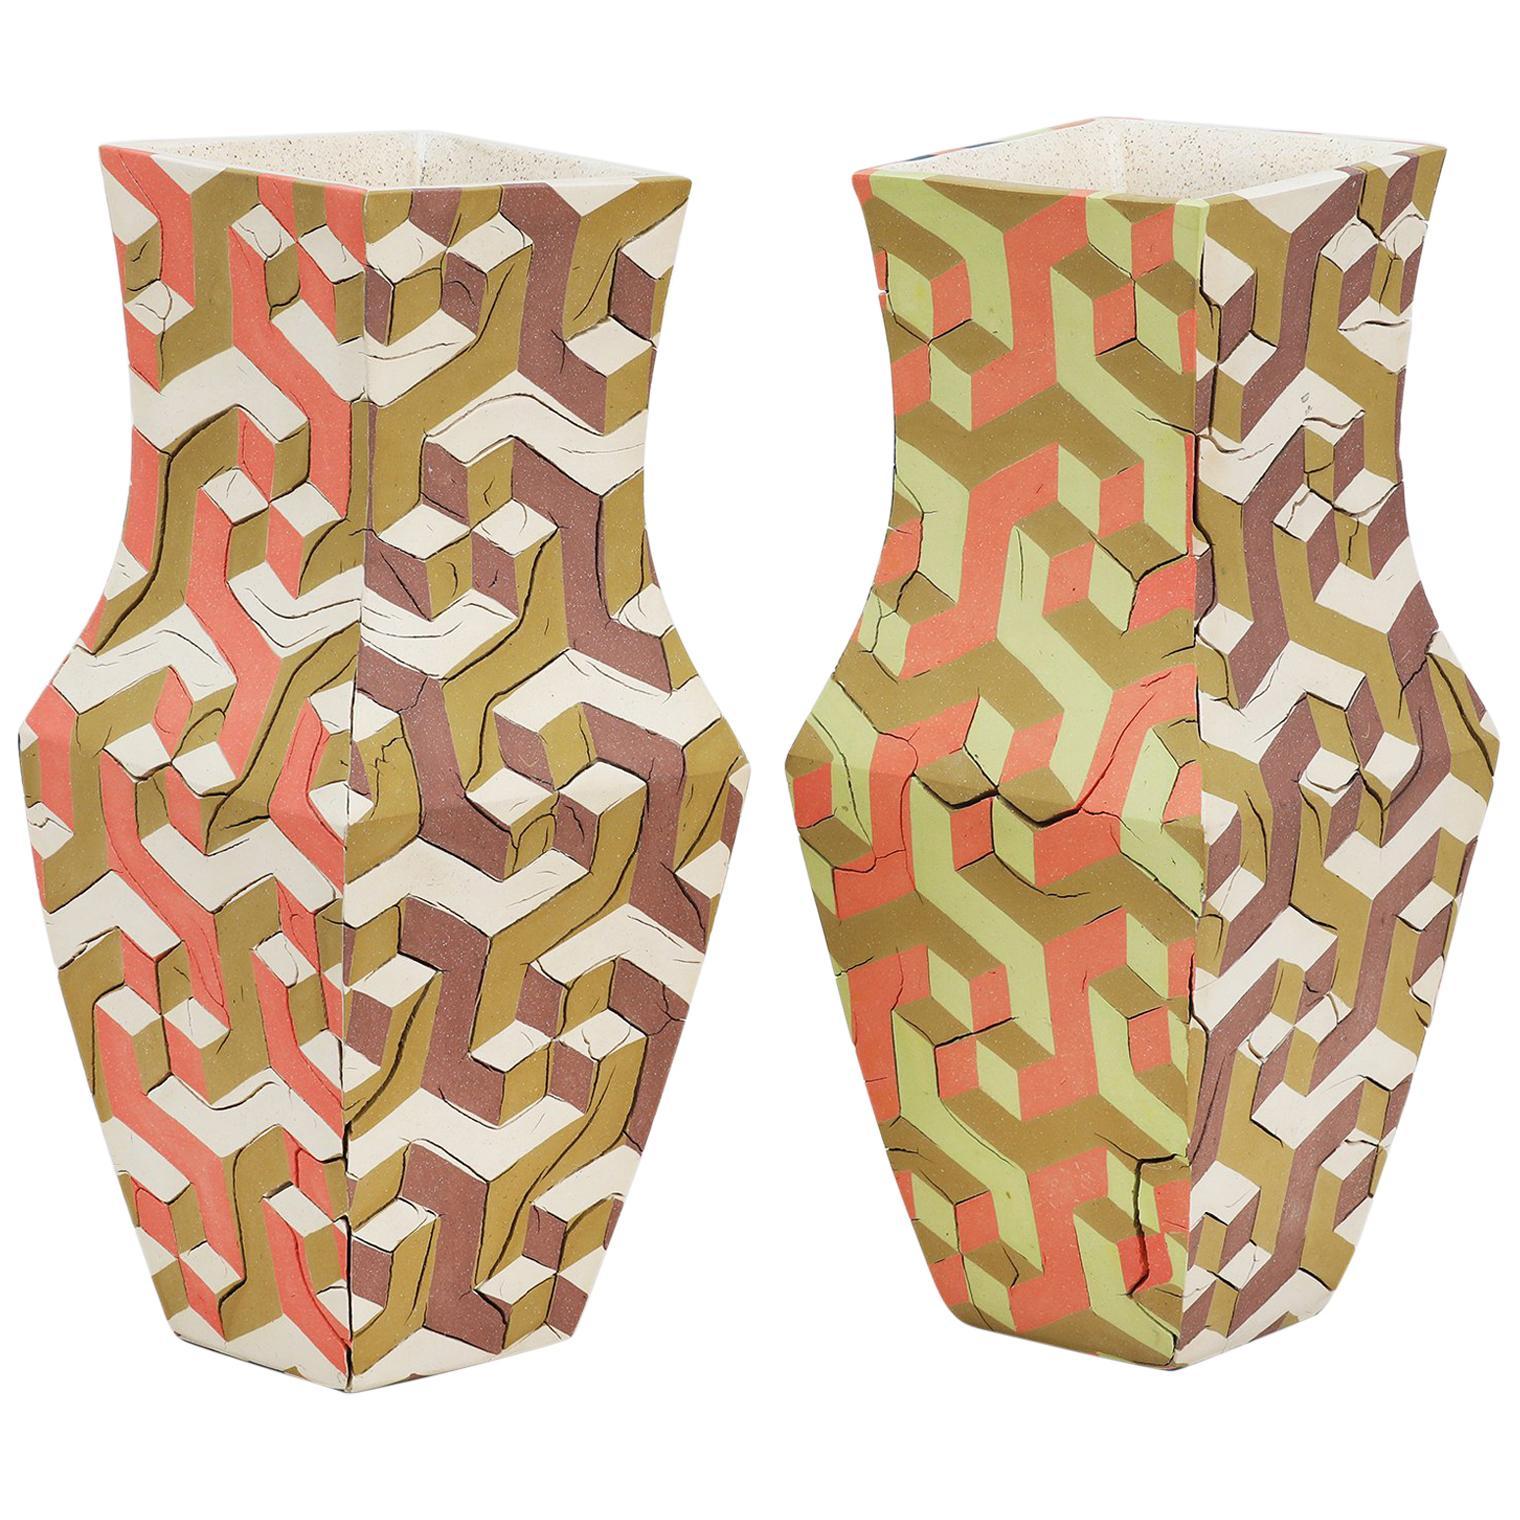 "Cody Hoyt ""Curved Walls (Twins)"" Ceramic Vessels"